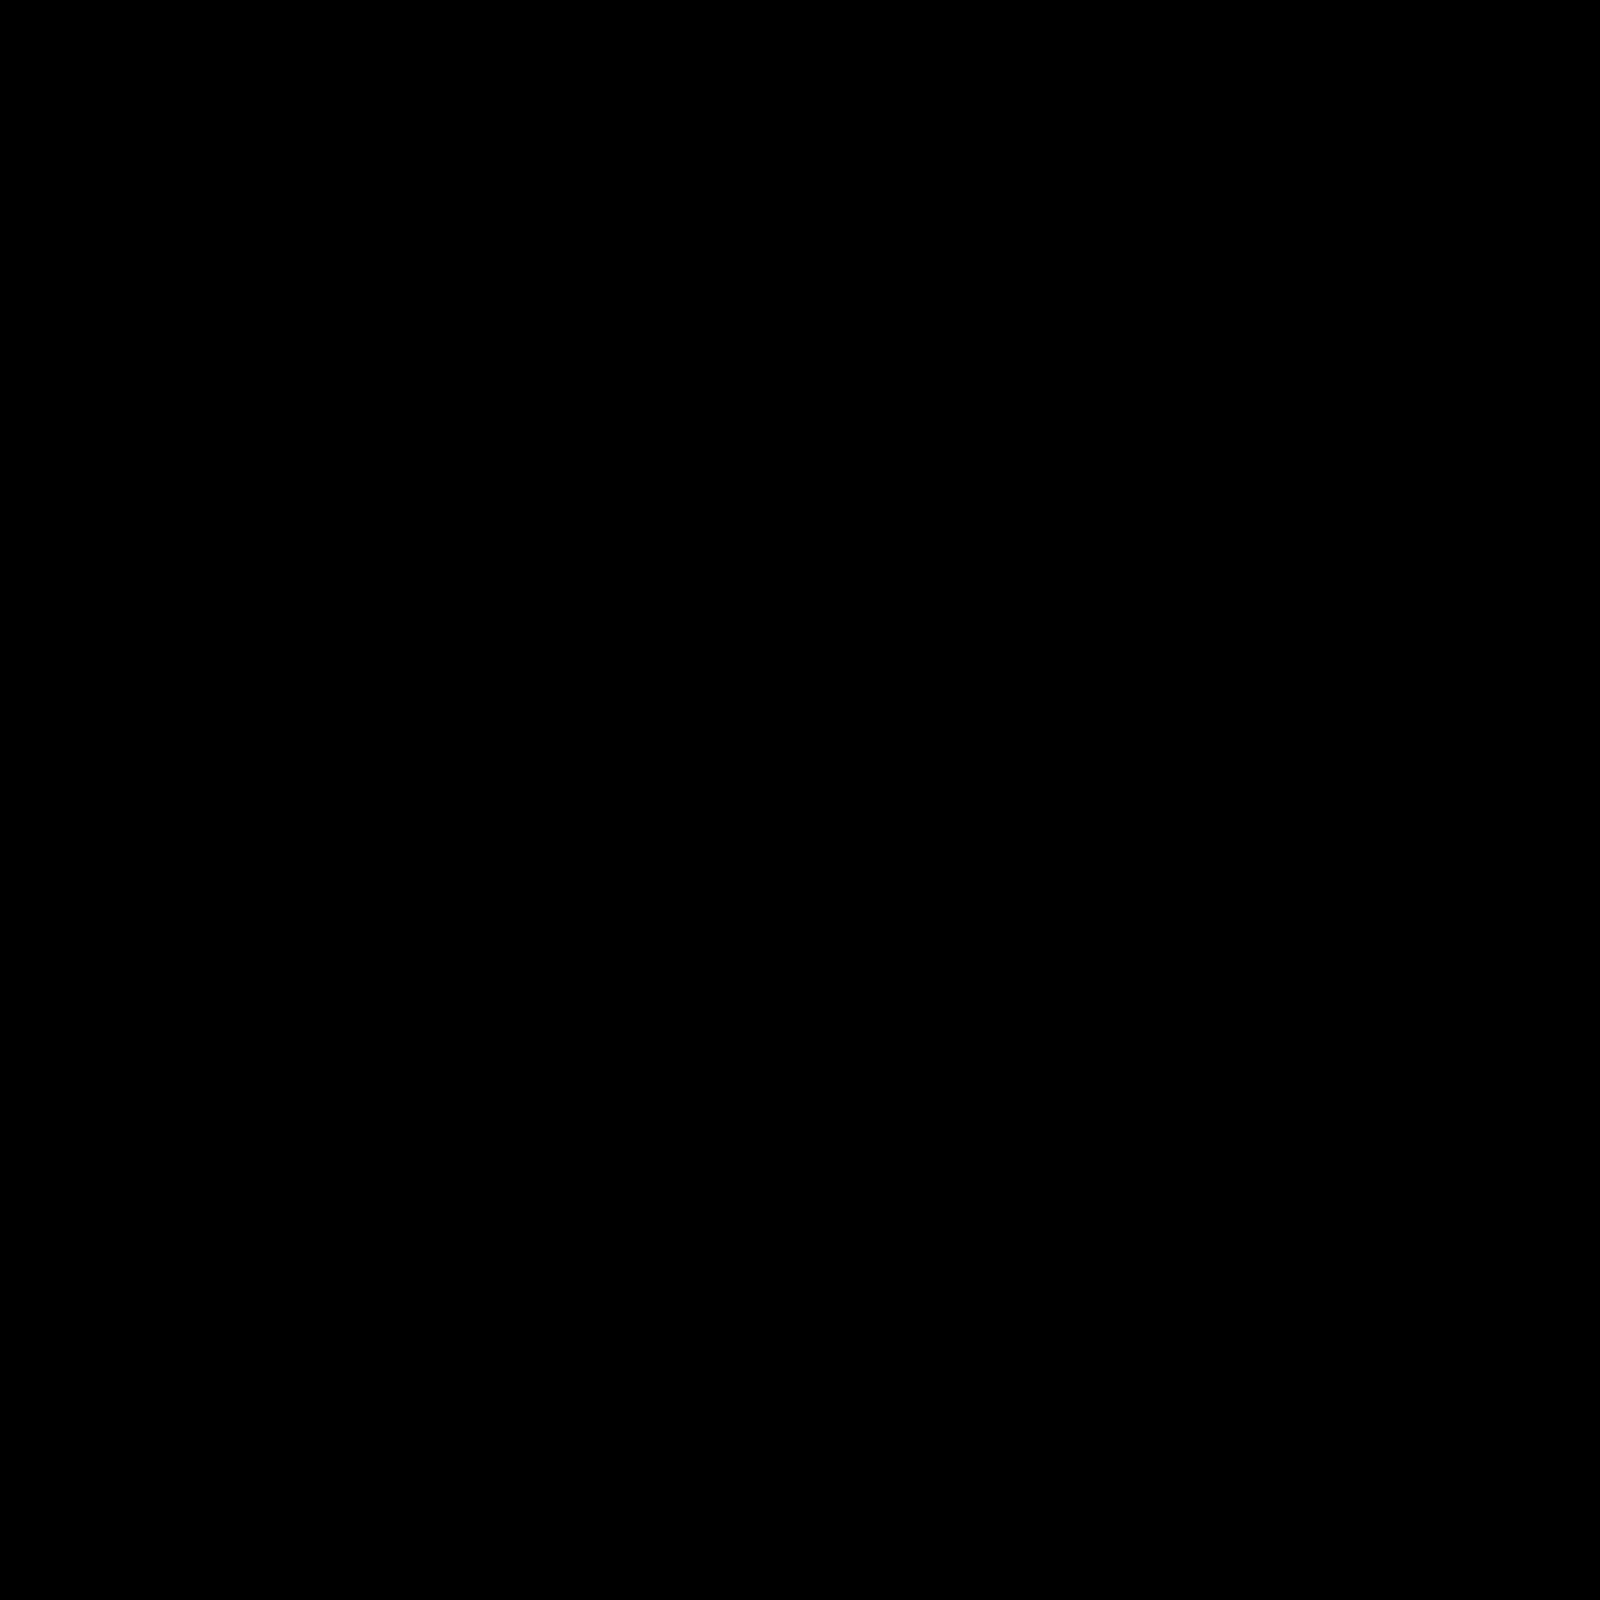 tablica flipchart icon